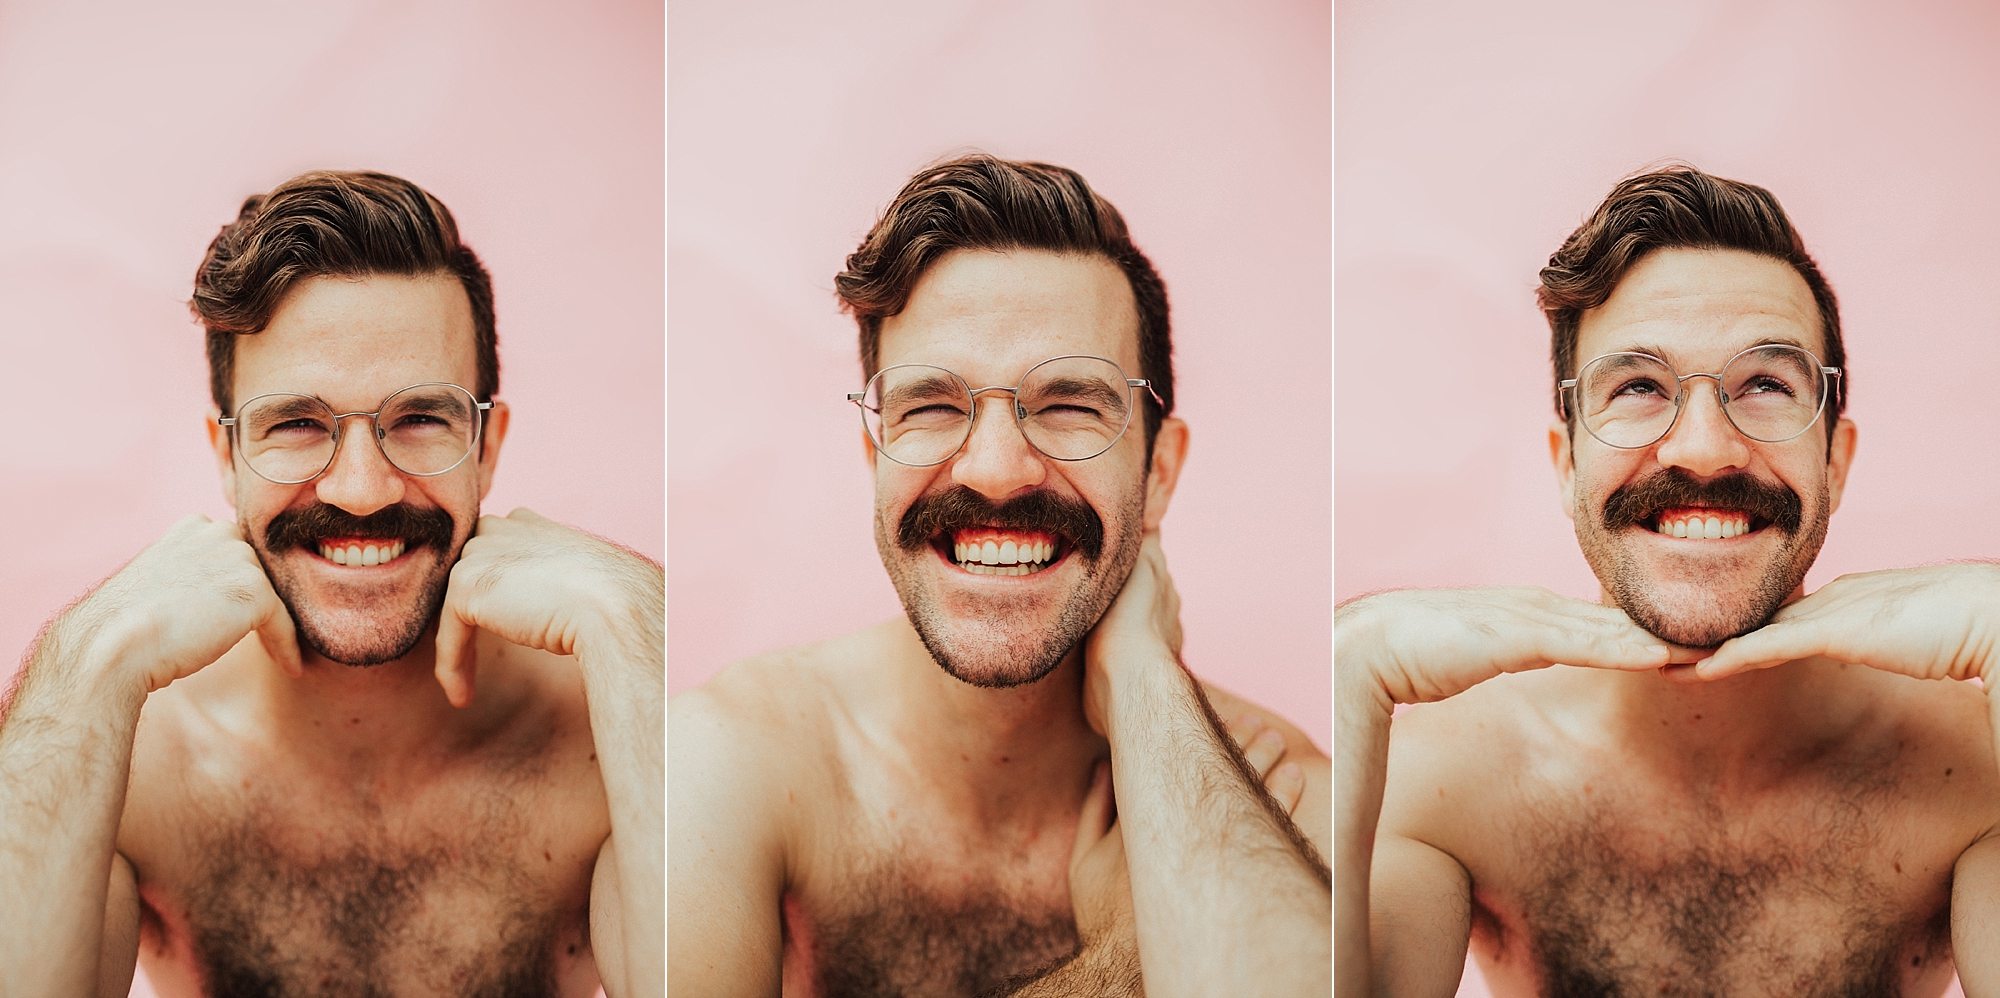 Joe_Mac_Creative_Patrick_Philadelphia_Gay_Fashion_Photography__0014.jpg